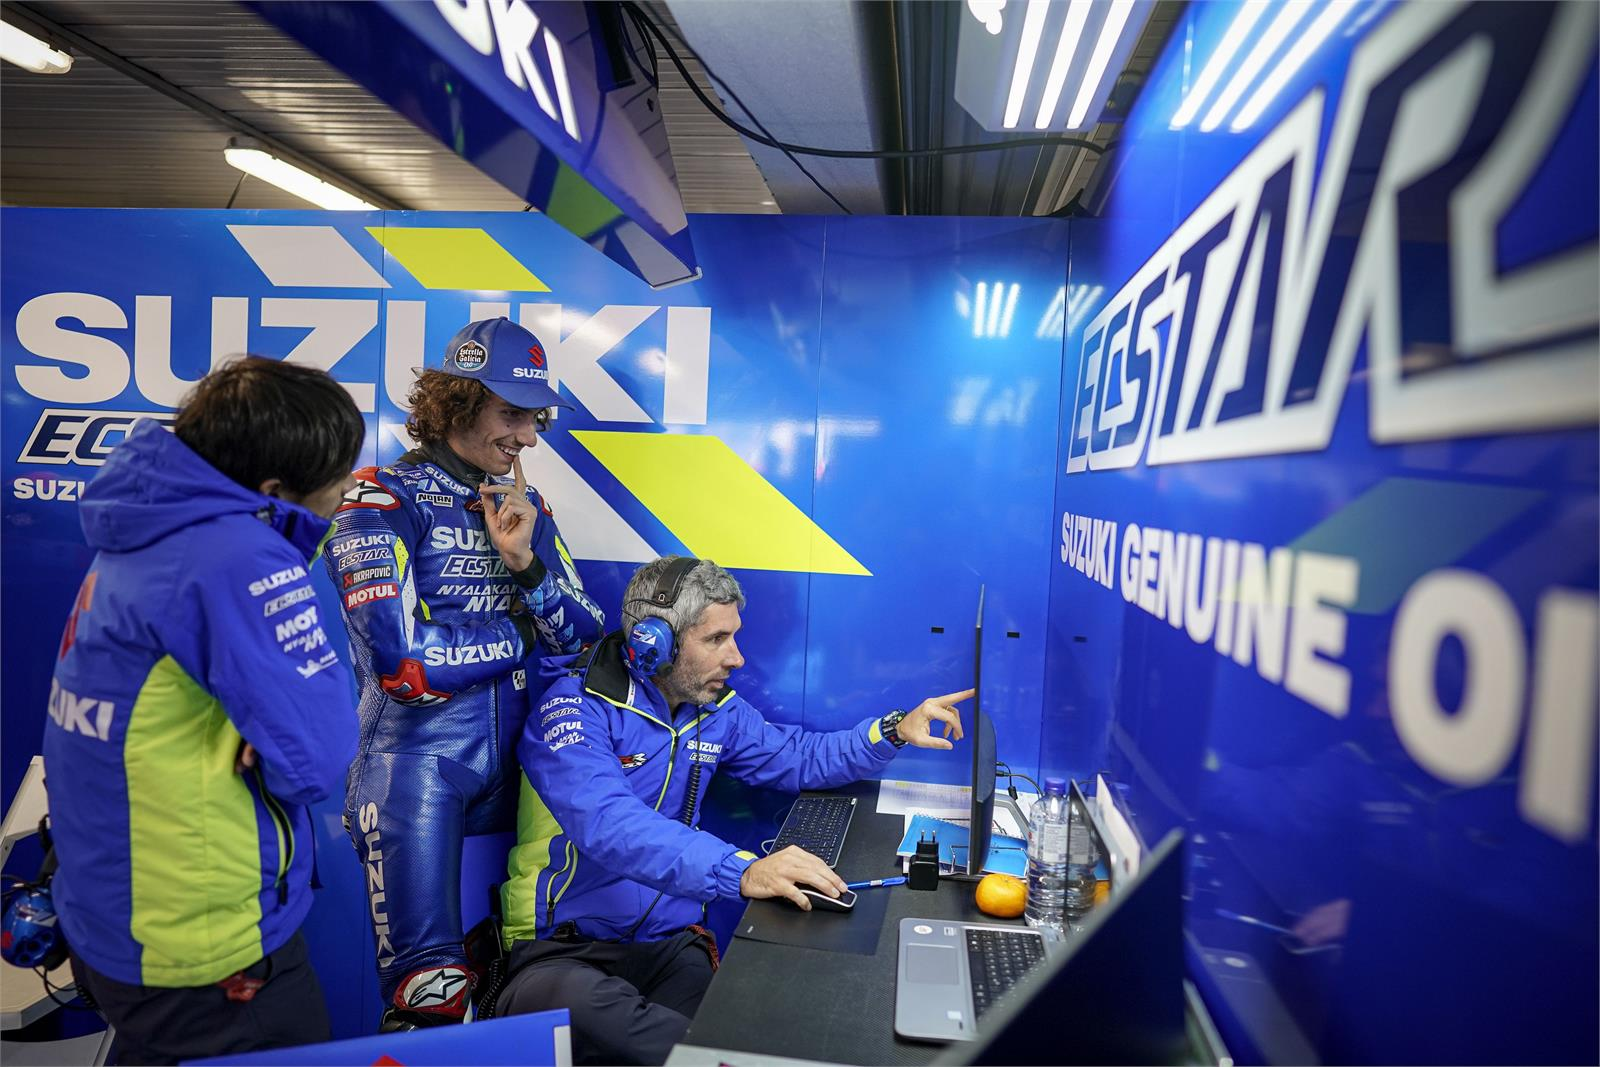 MotoGP2019オーストラリアGP リンス「明日同じコンディションならレースは出来ない」